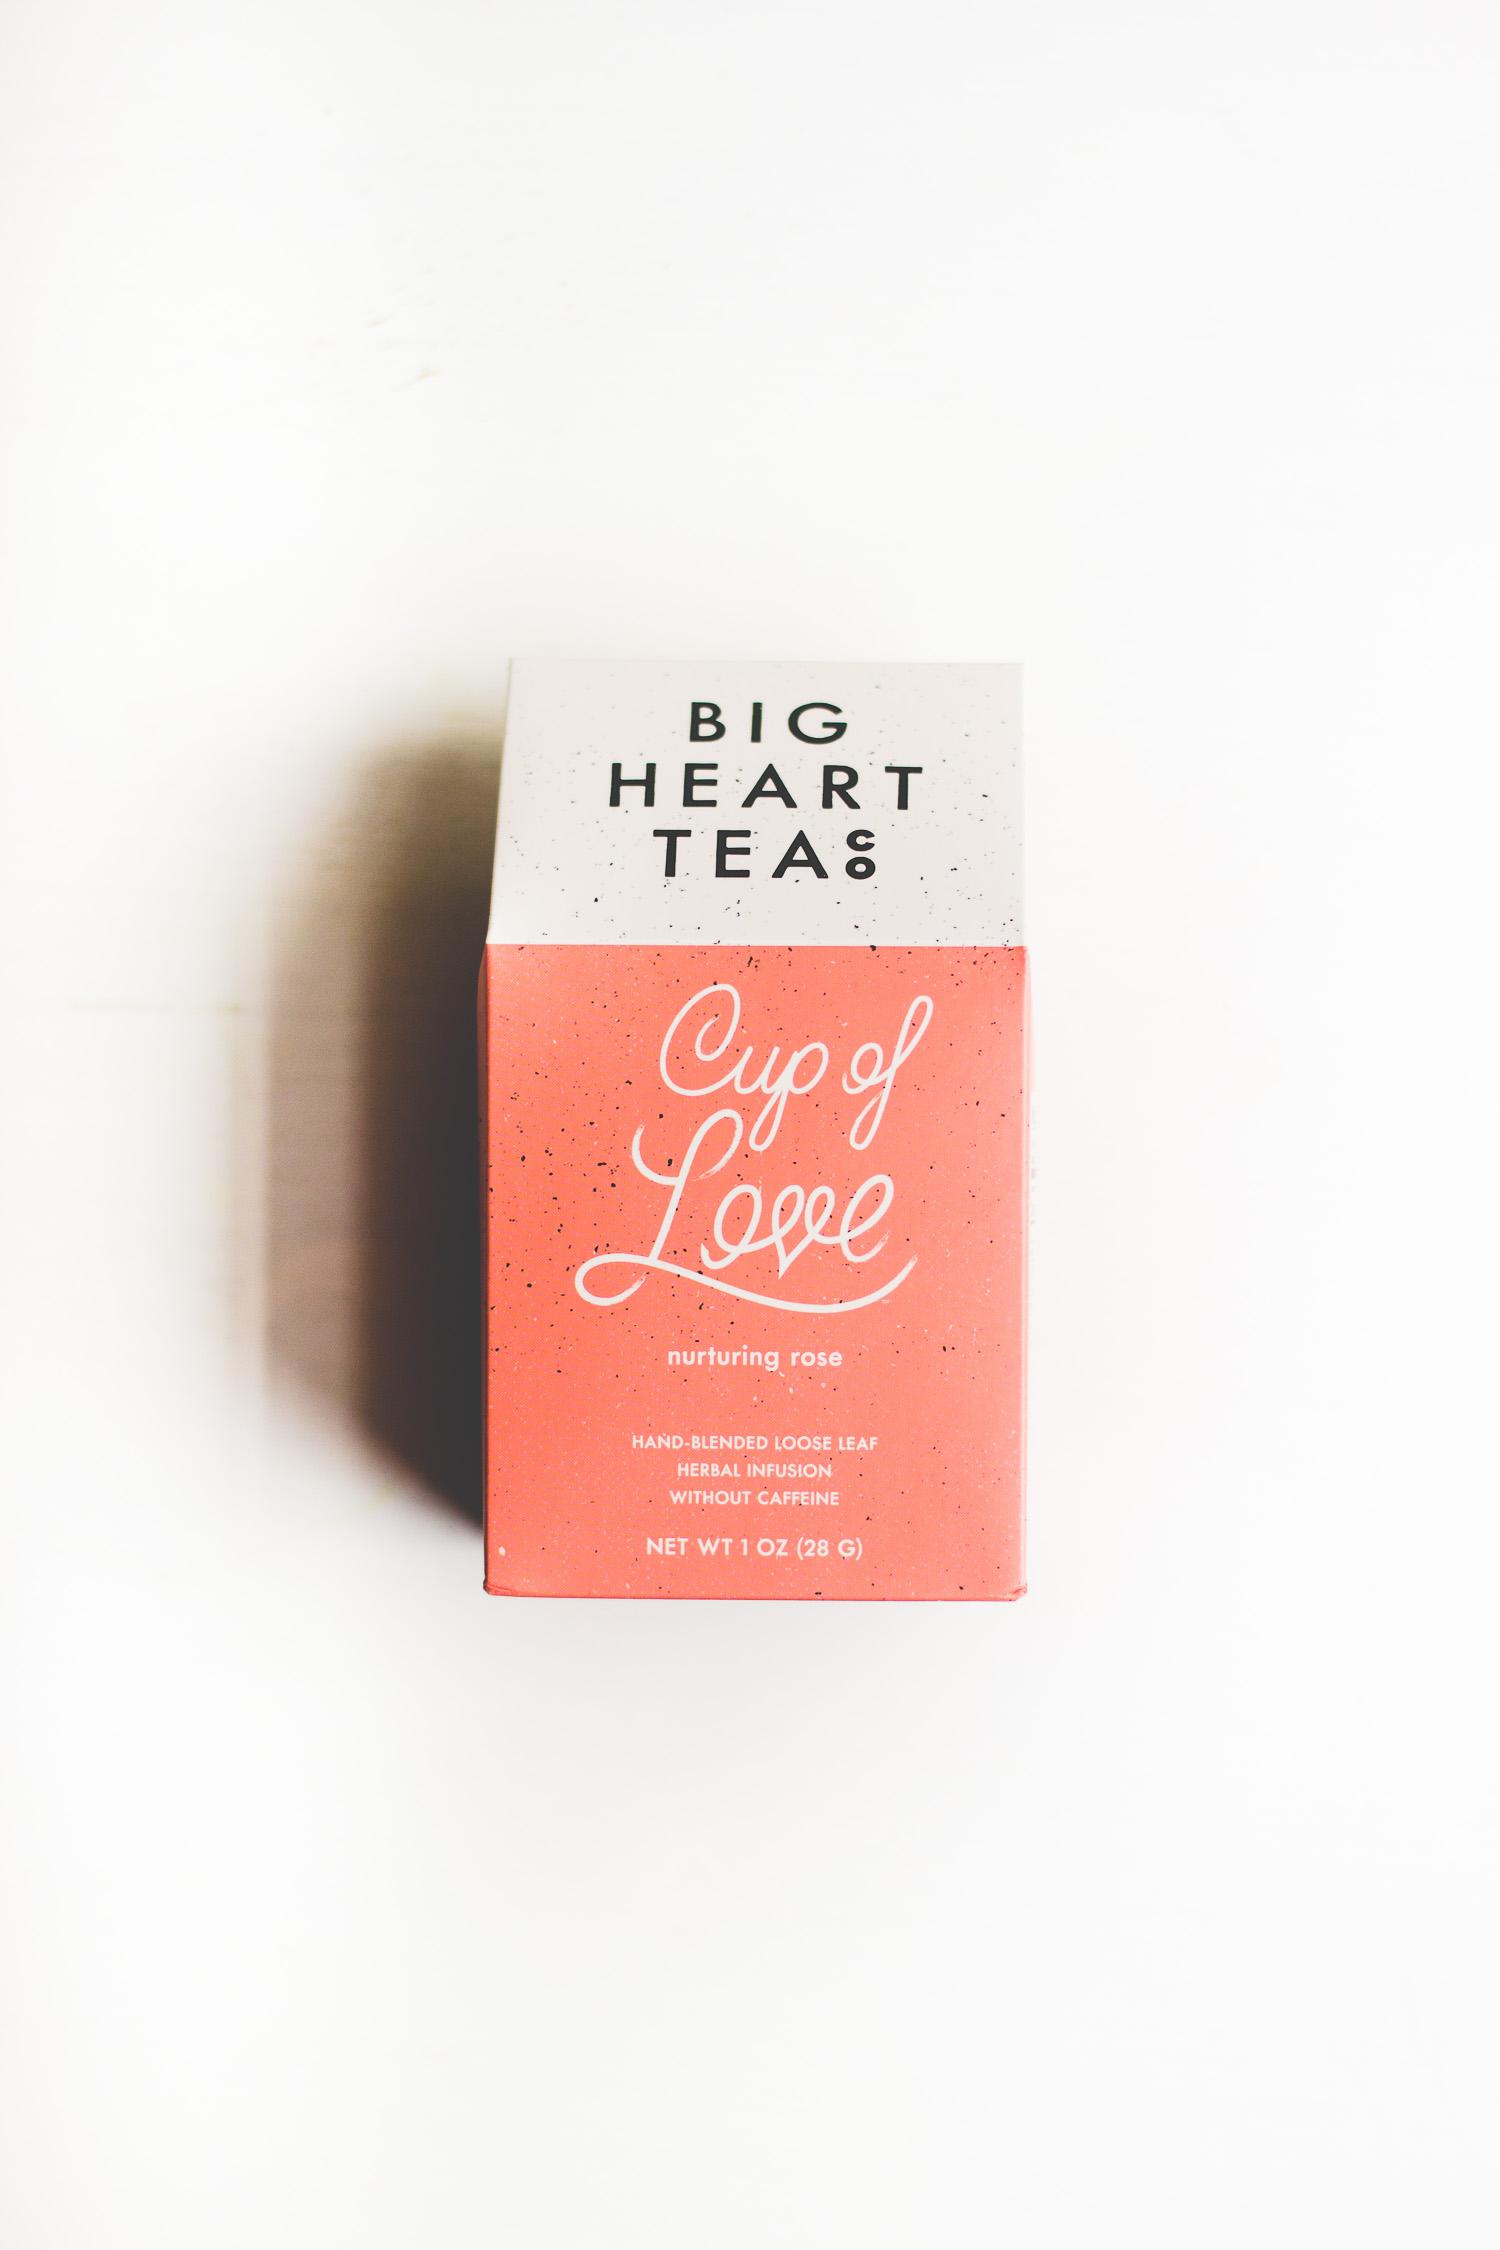 big-heart-tea-cup-of-love-box.jpg